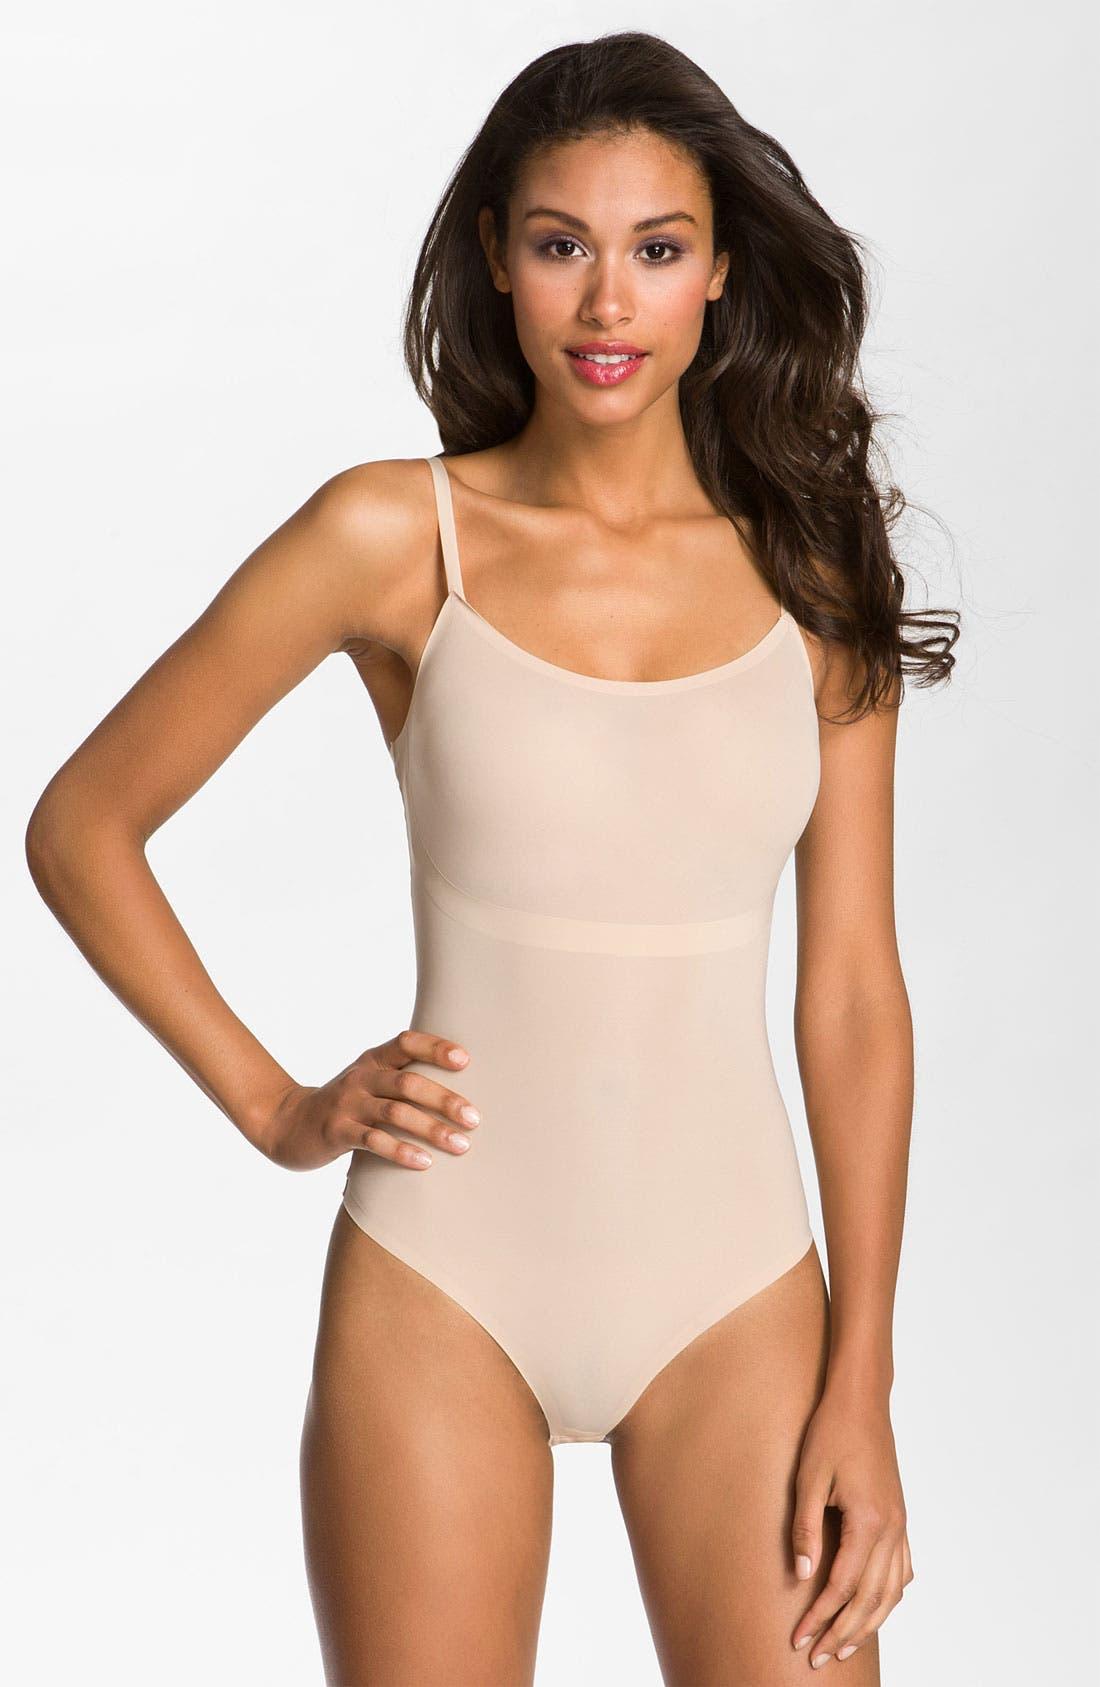 Alternate Image 1 Selected - SPANX® 'Thinstincts' Thong Bodysuit Shaper